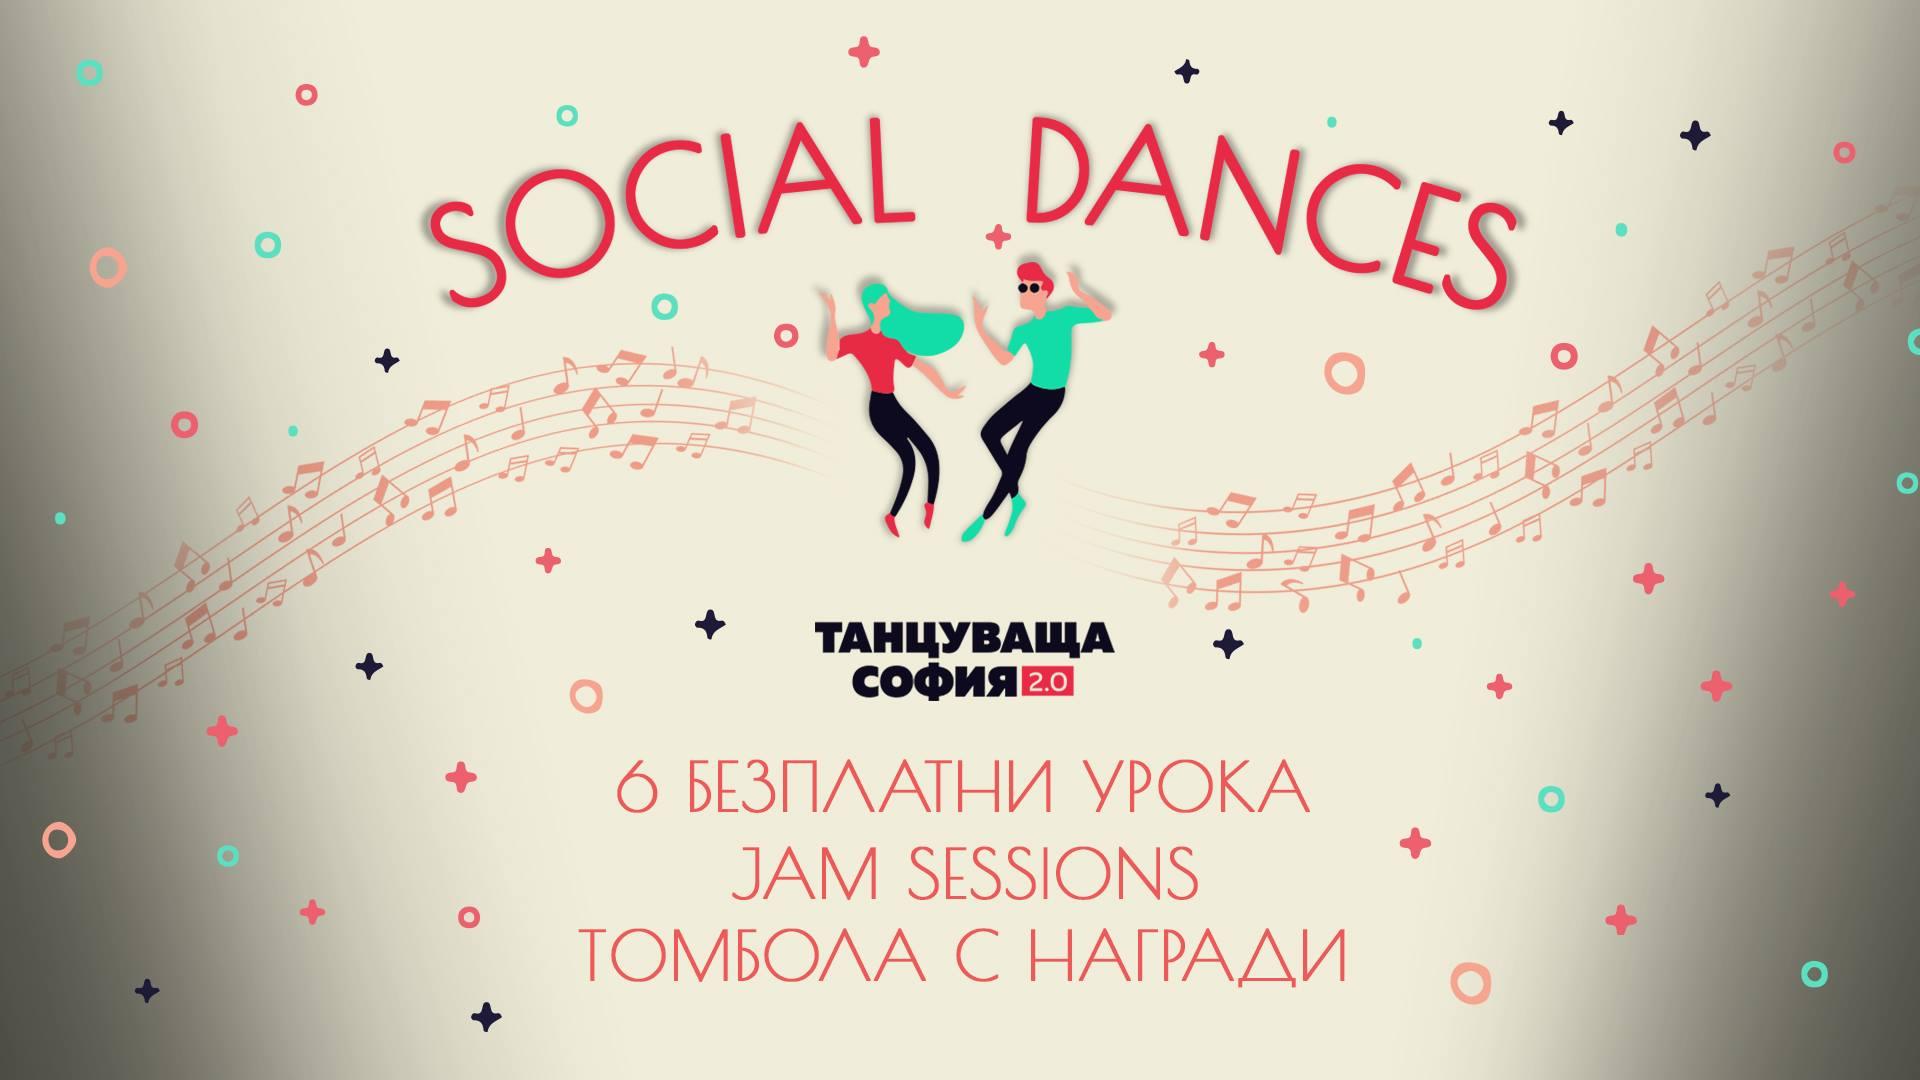 Танцуваща София 2.0 | Social Dances [вход свободен]